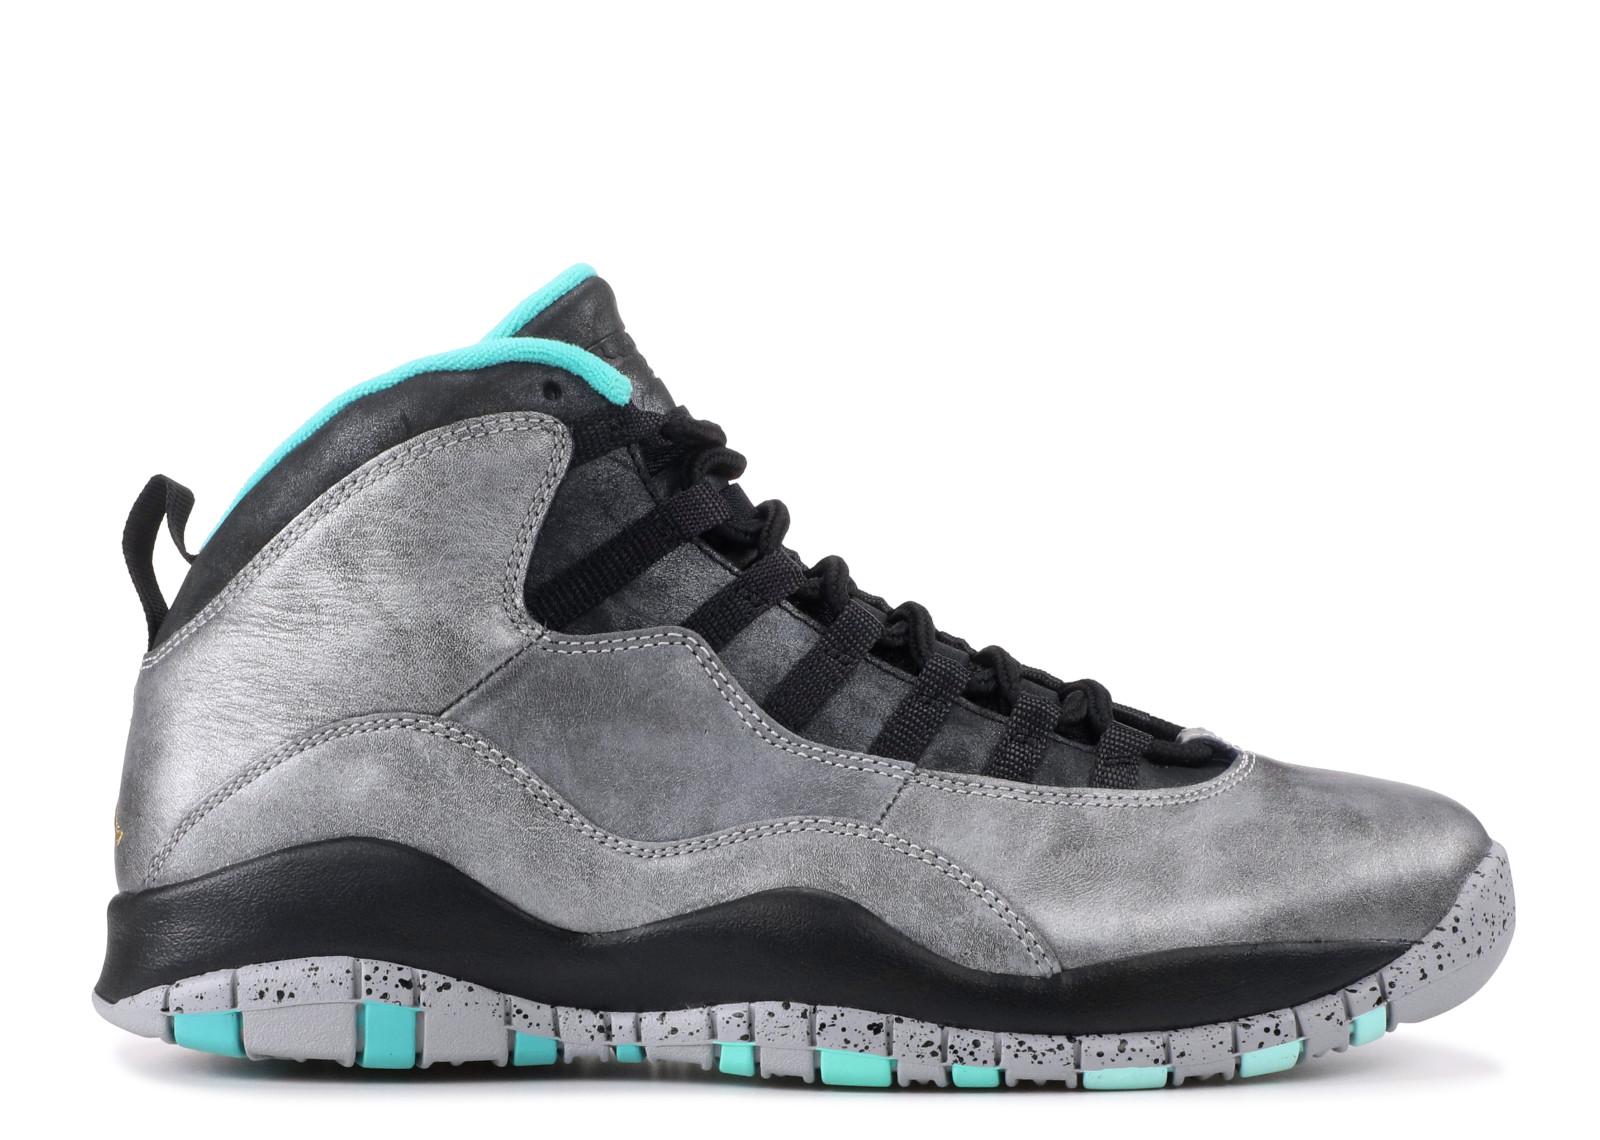 on sale f26b7 471c4 Kick Avenue - Authentic Sneakers